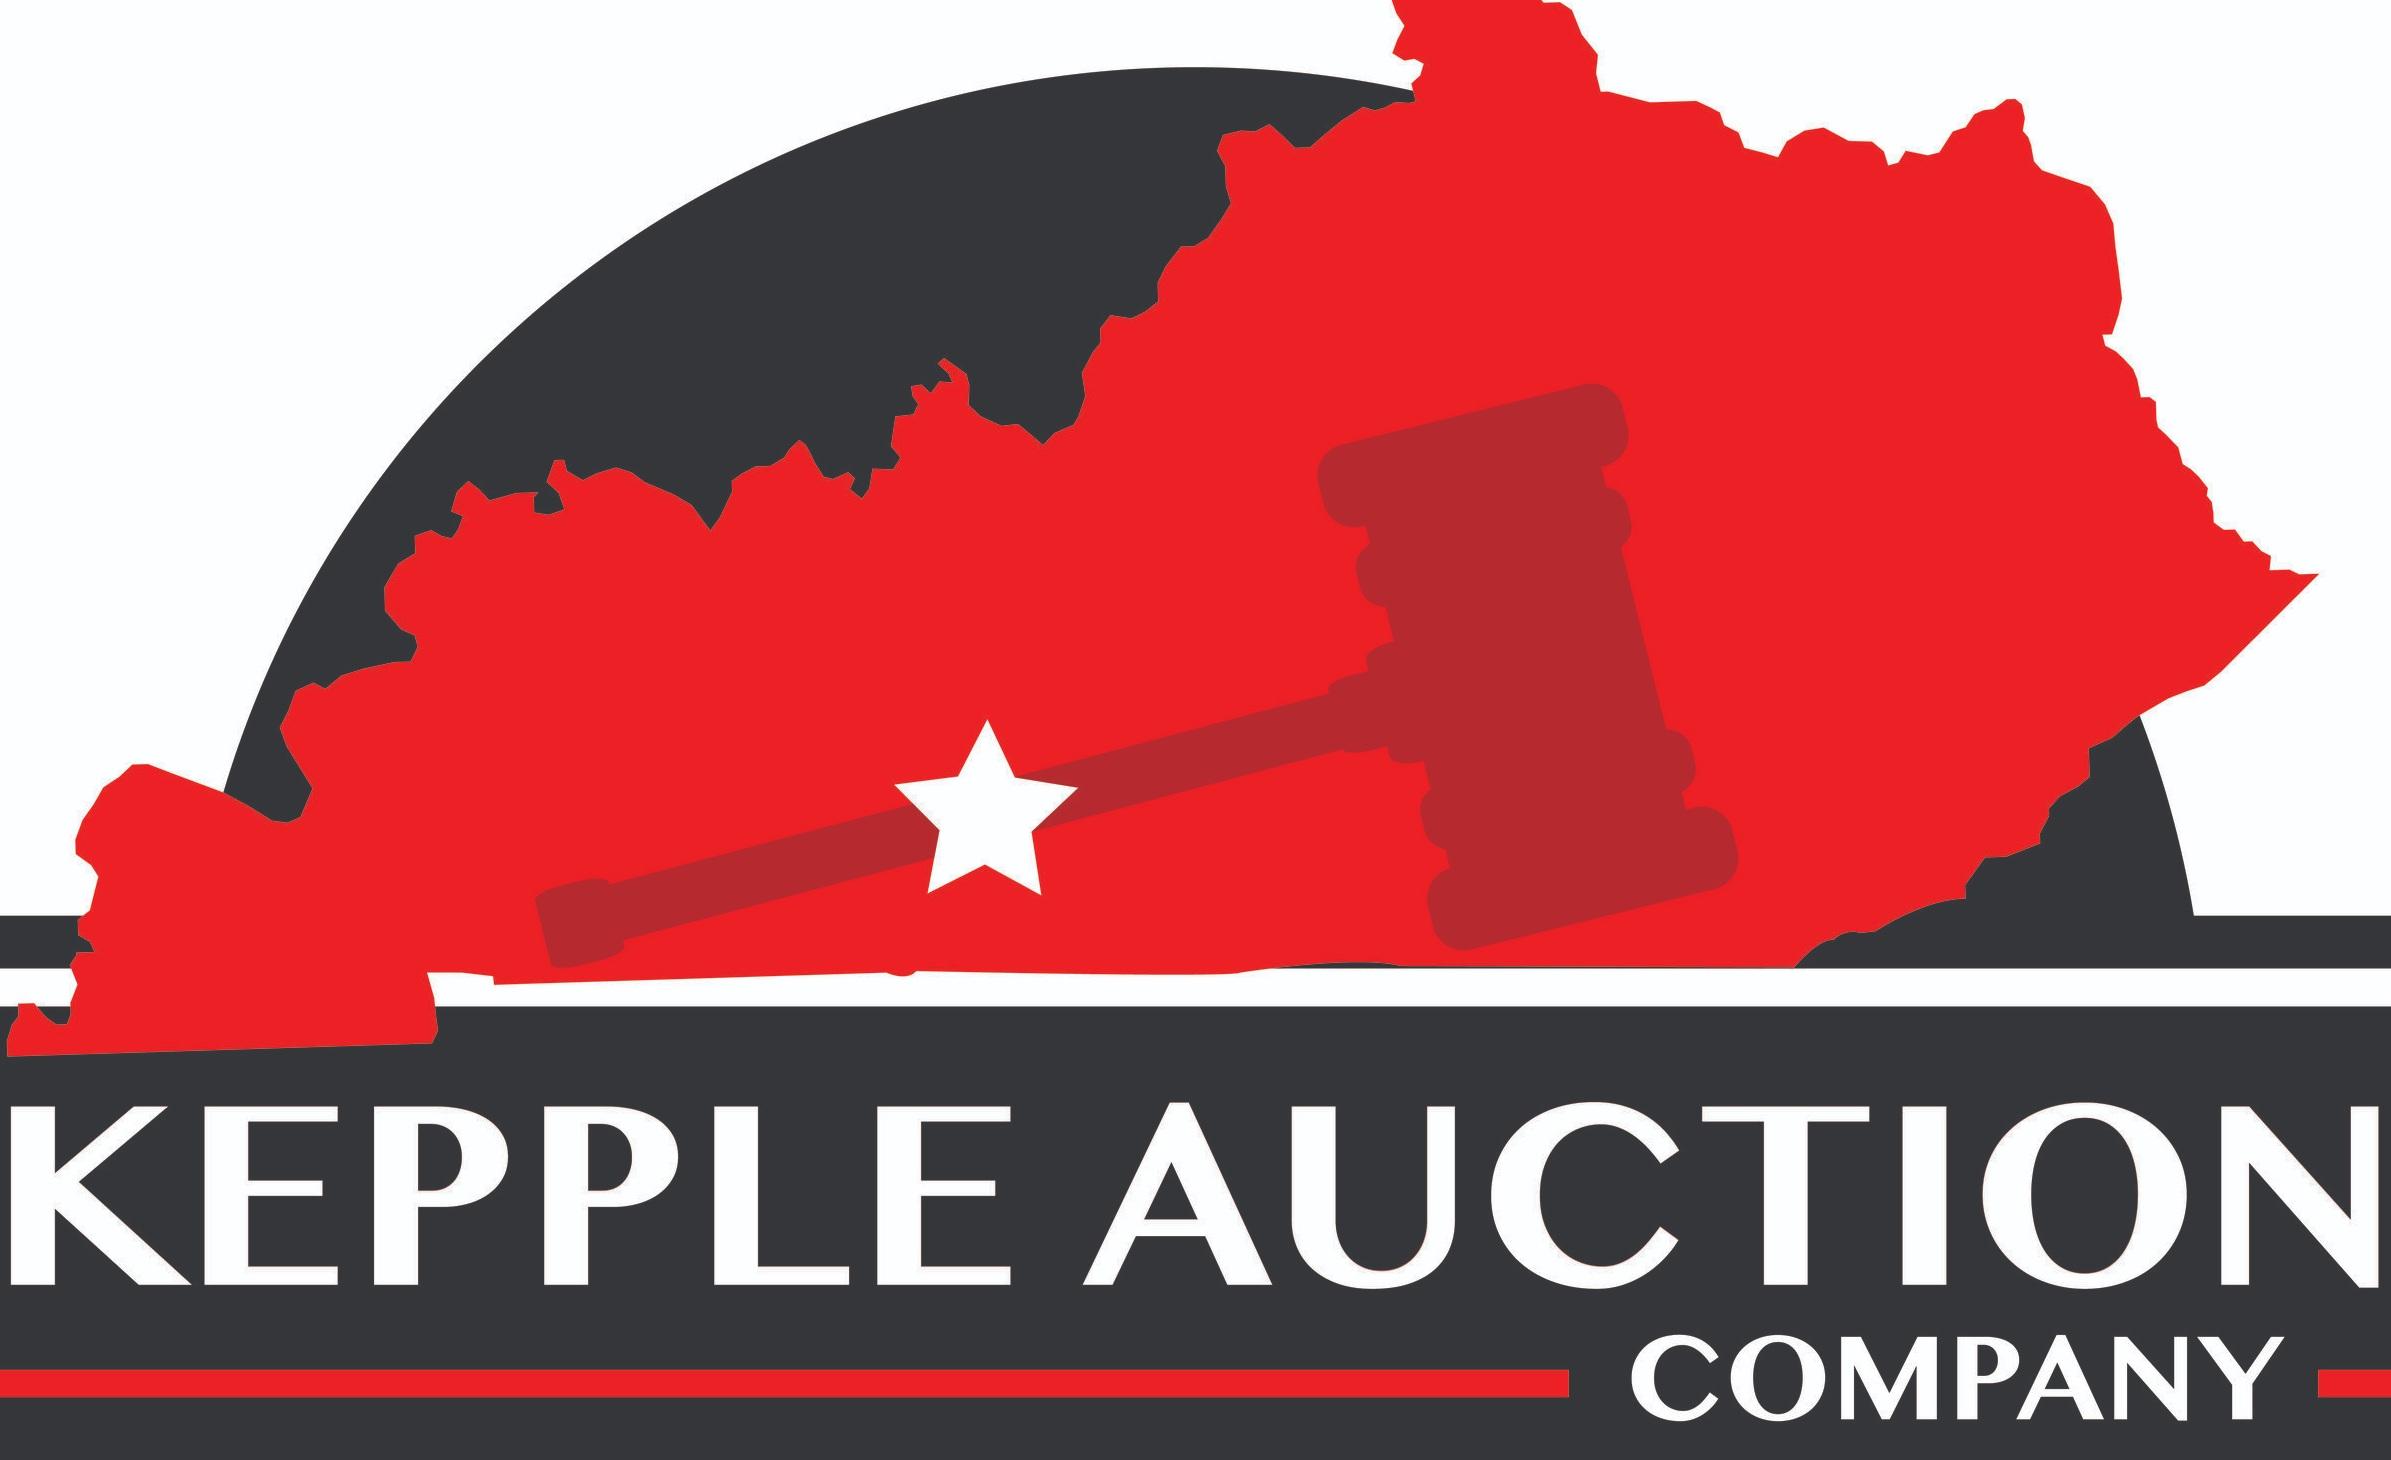 Kepple+Auction+Company%2C+Bowling+Green+KY